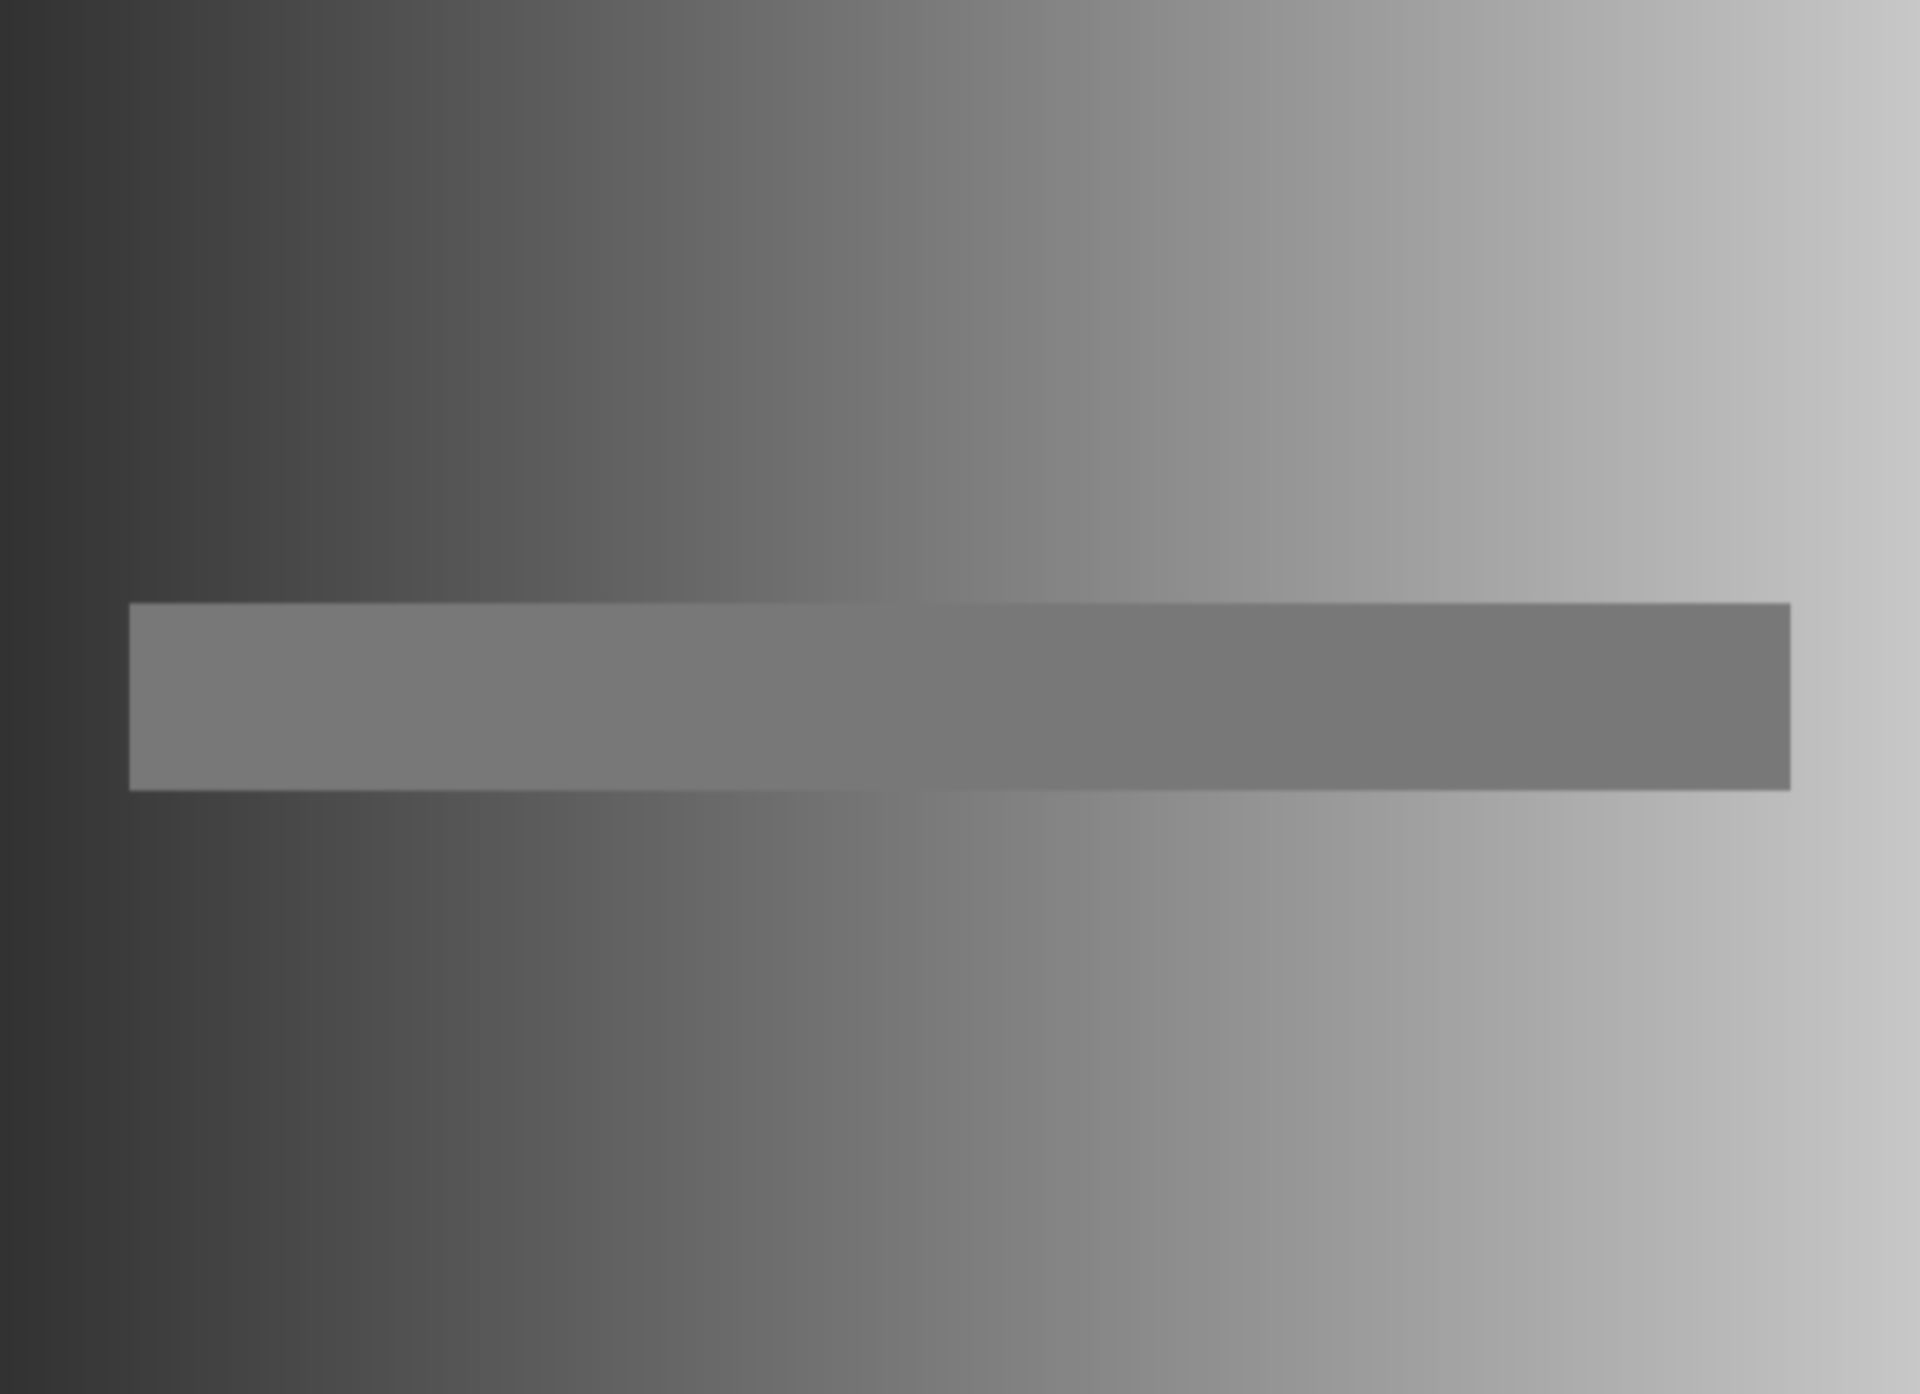 Relativity of brightness and color perception